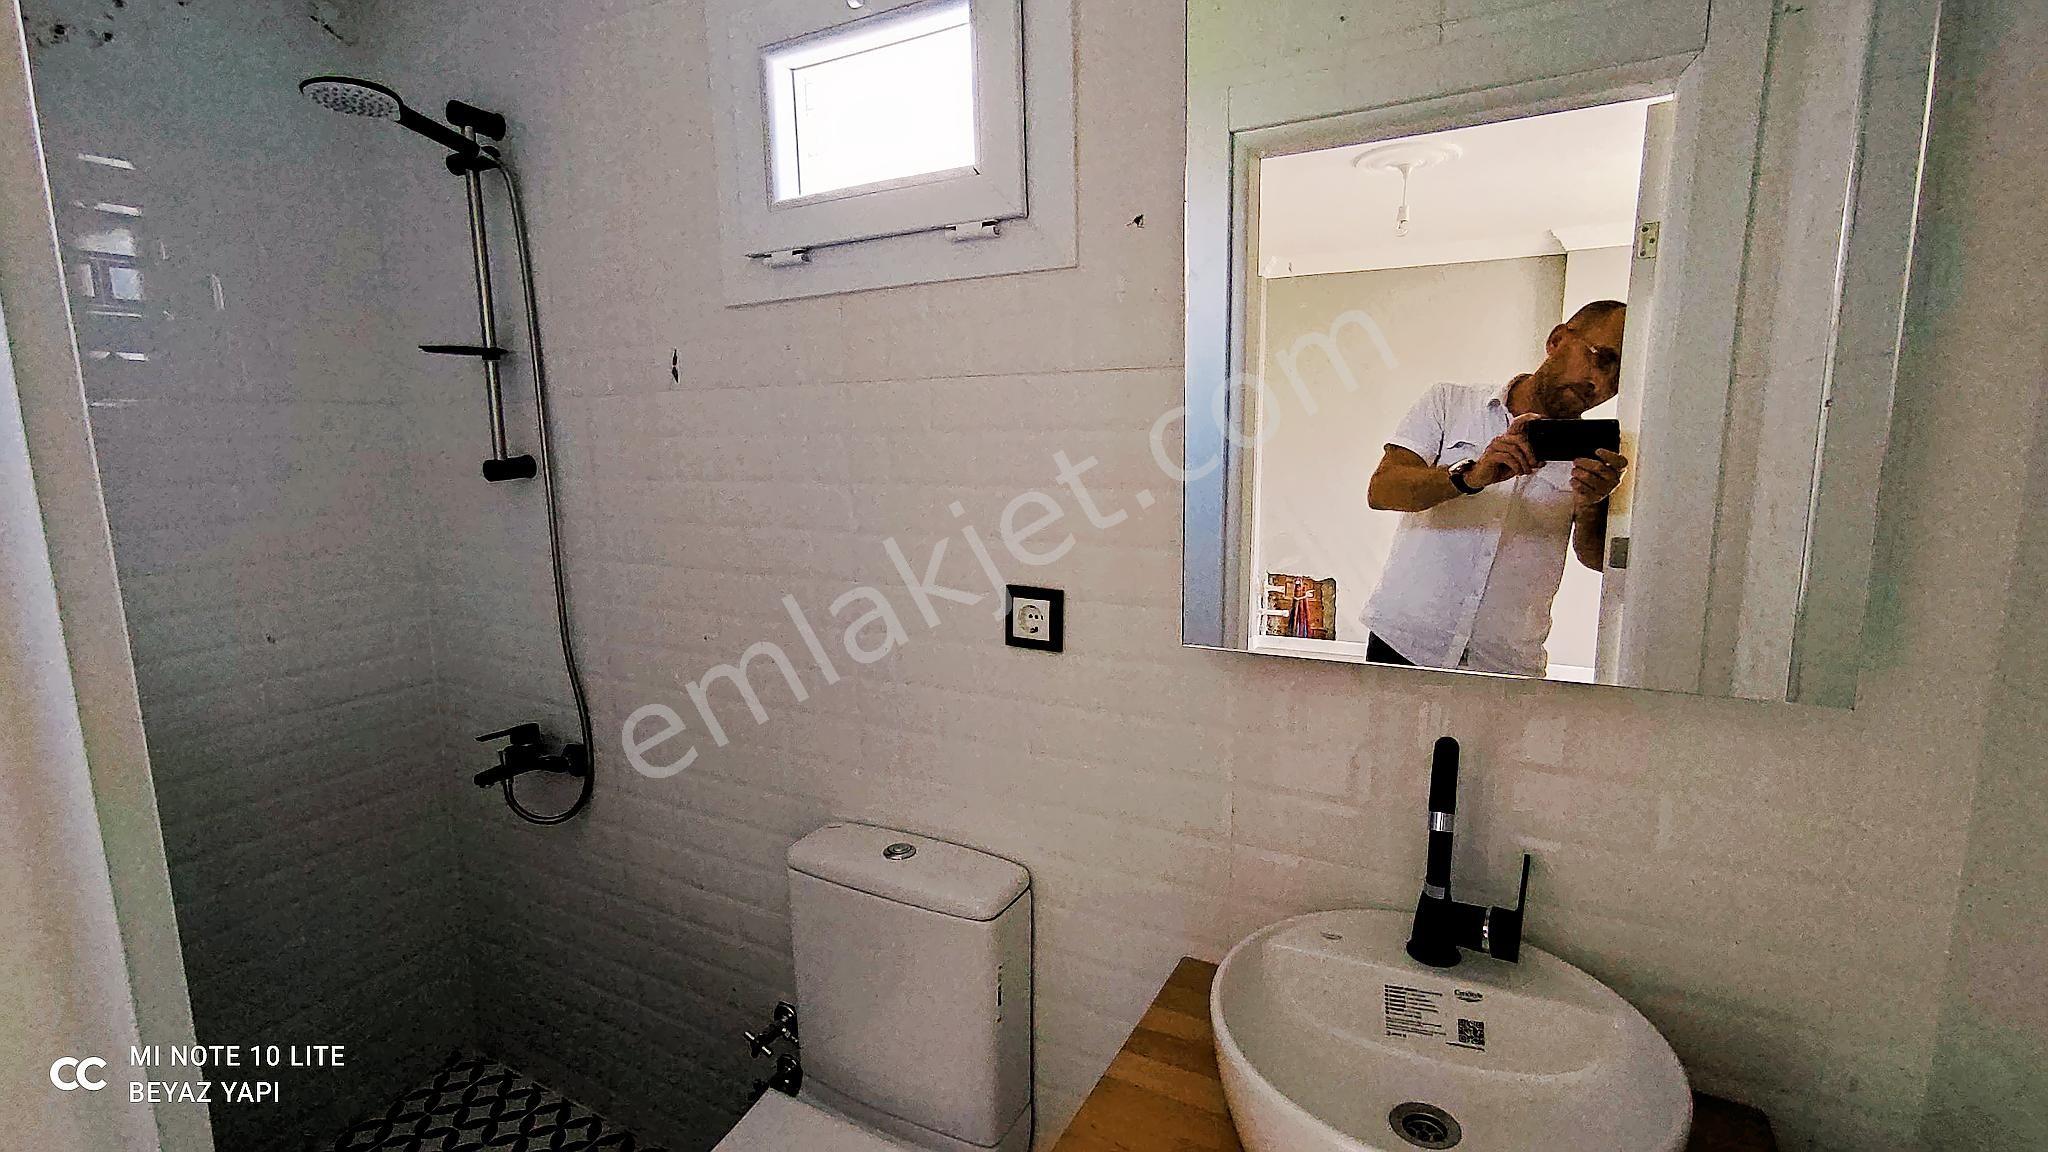 https://imaj.emlakjet.com/oda/watermarked-image/test/2021-7-17/edited-9699300/245360581-edited.jpg